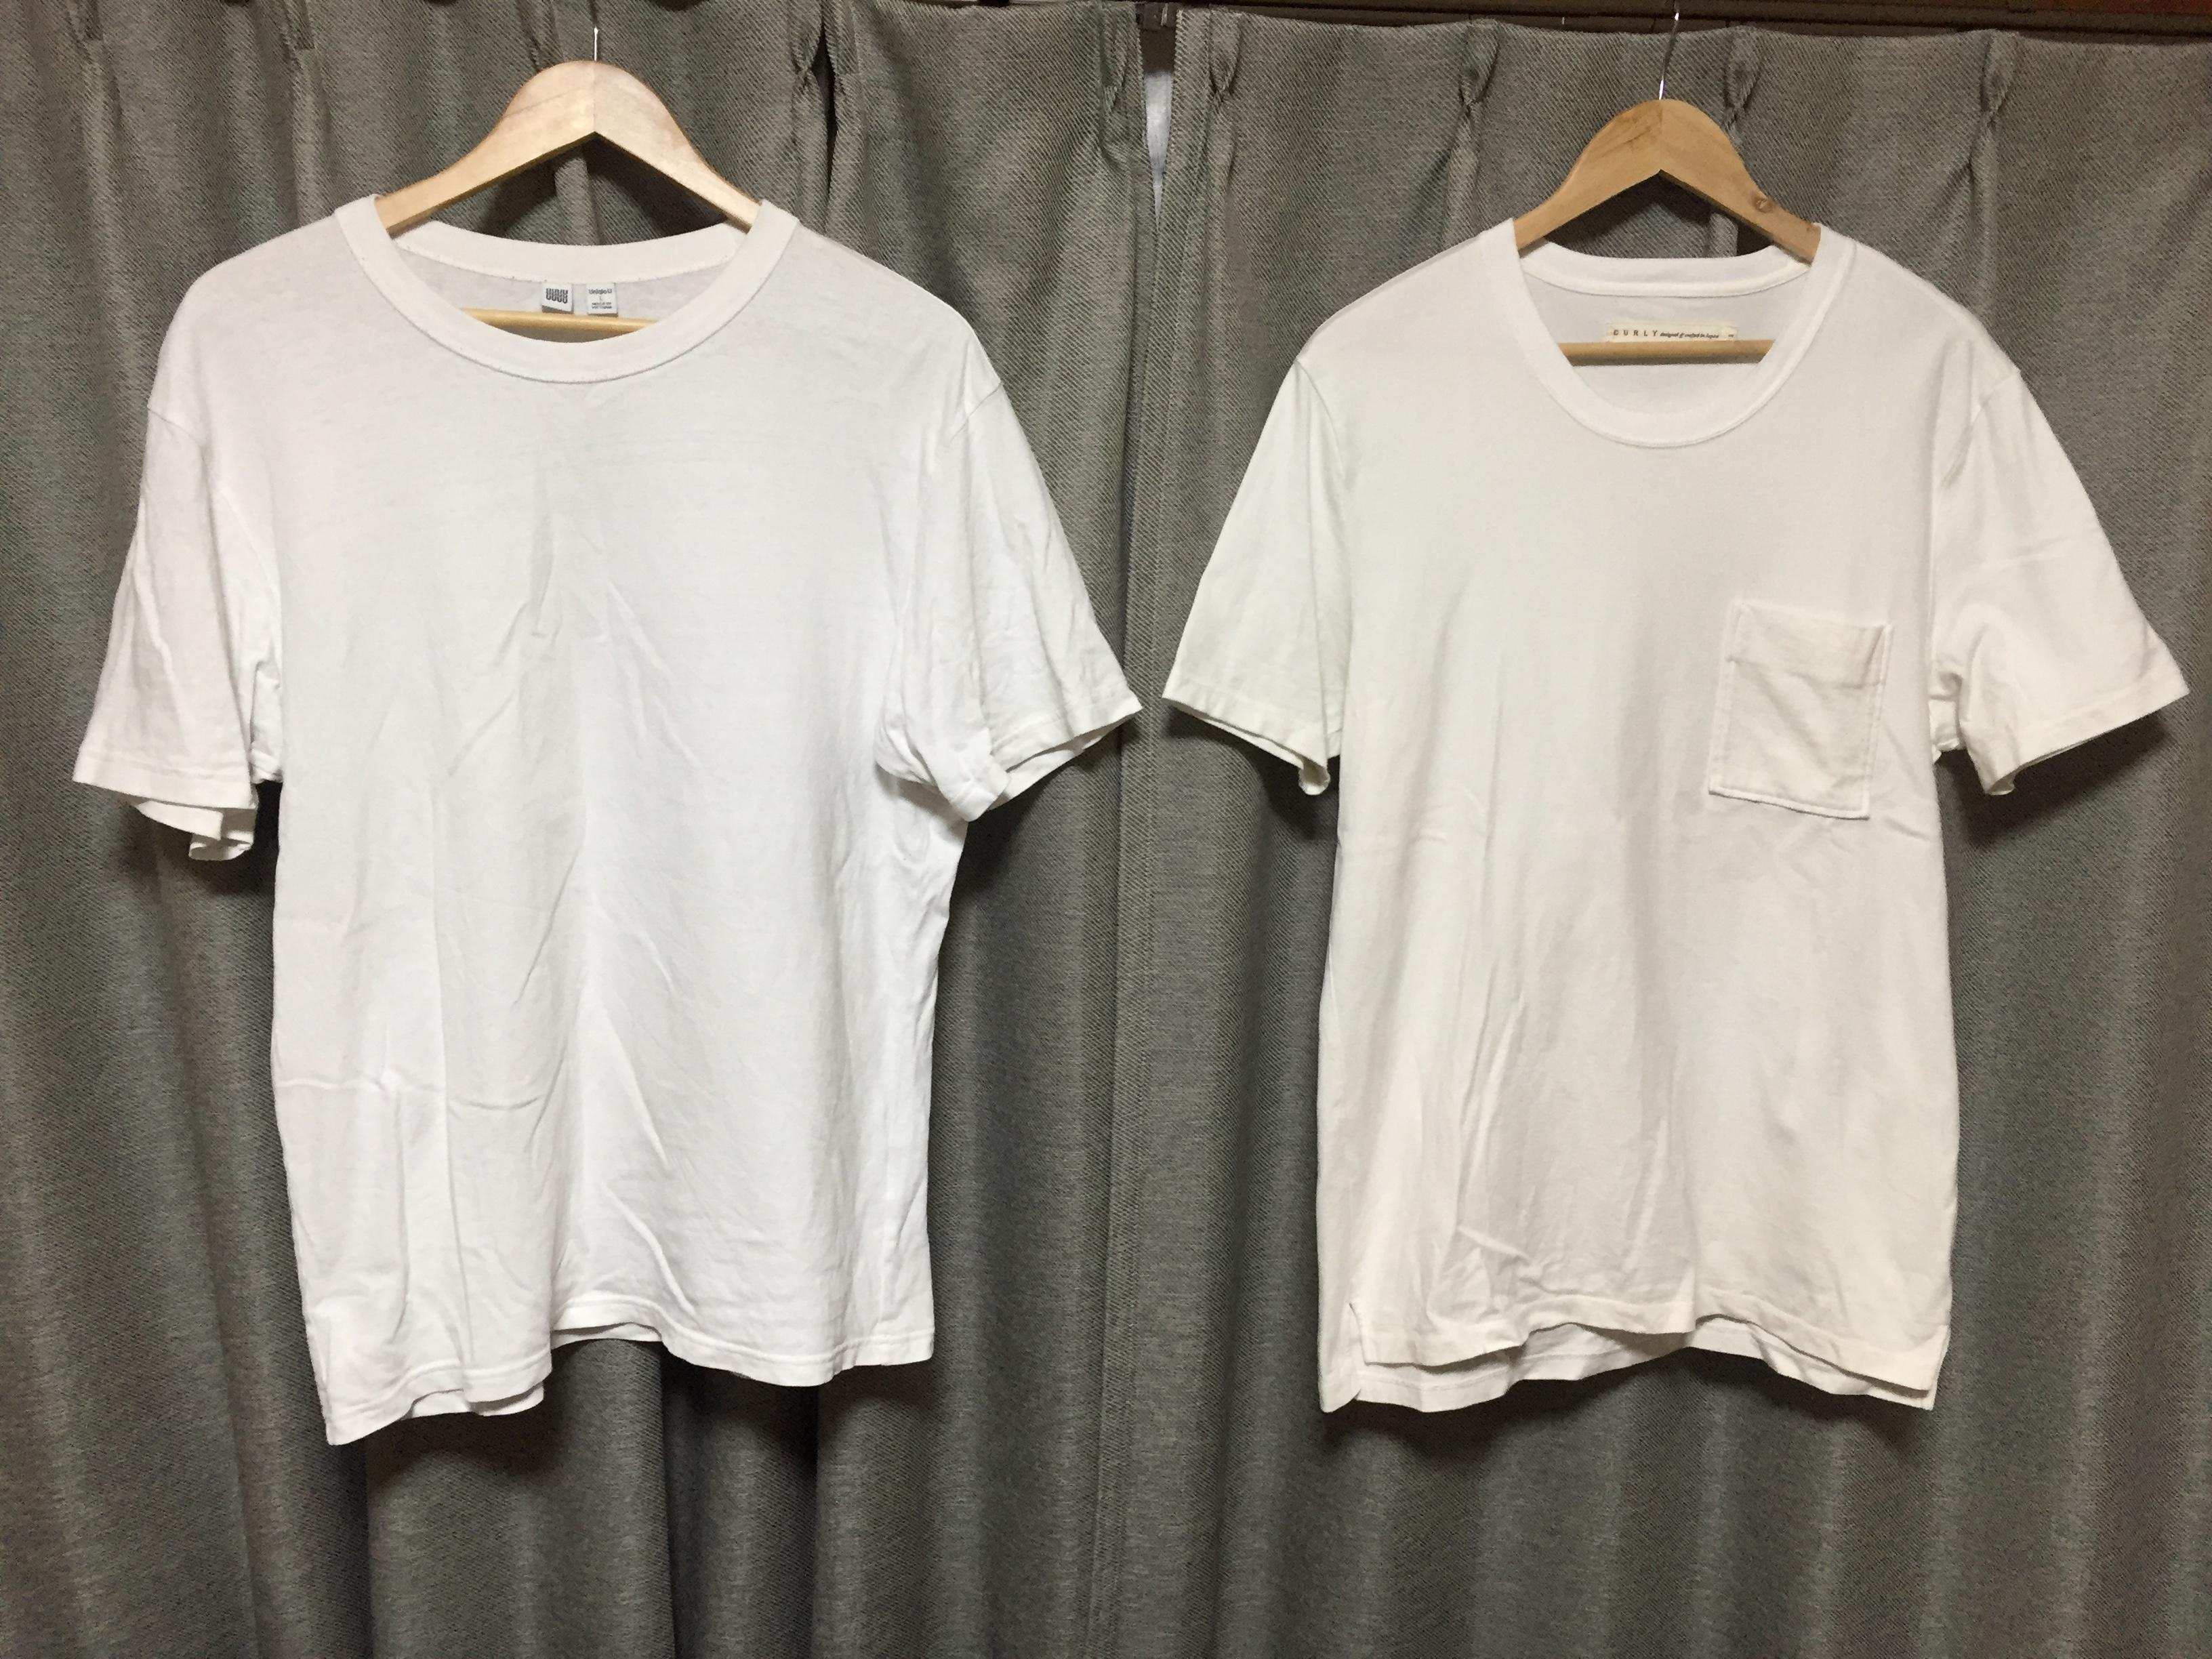 CURLYのTシャツとユニクロのTシャツ